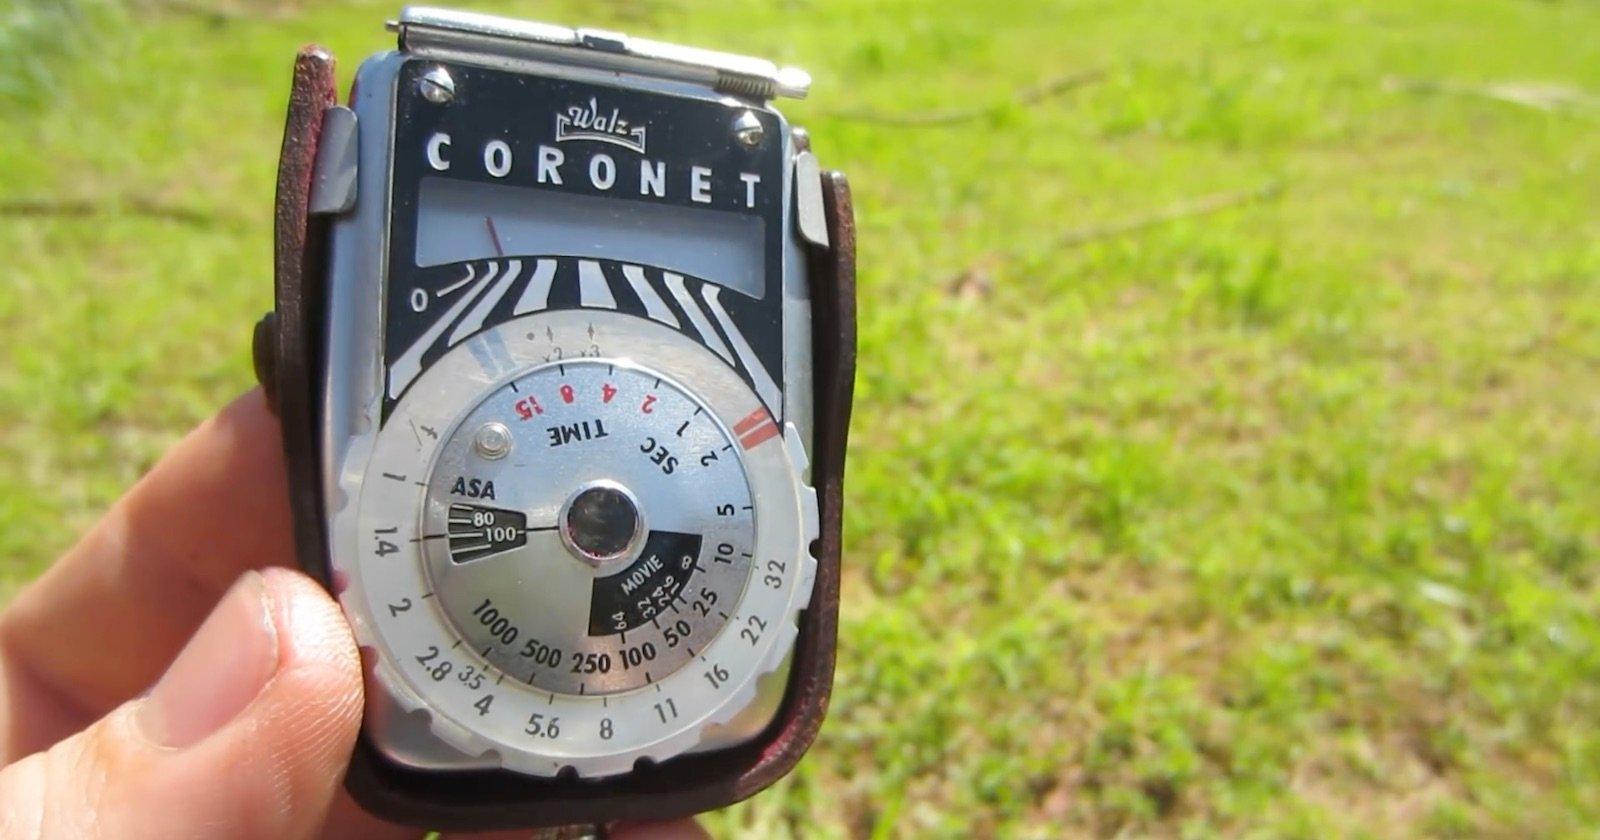 coronet_feature